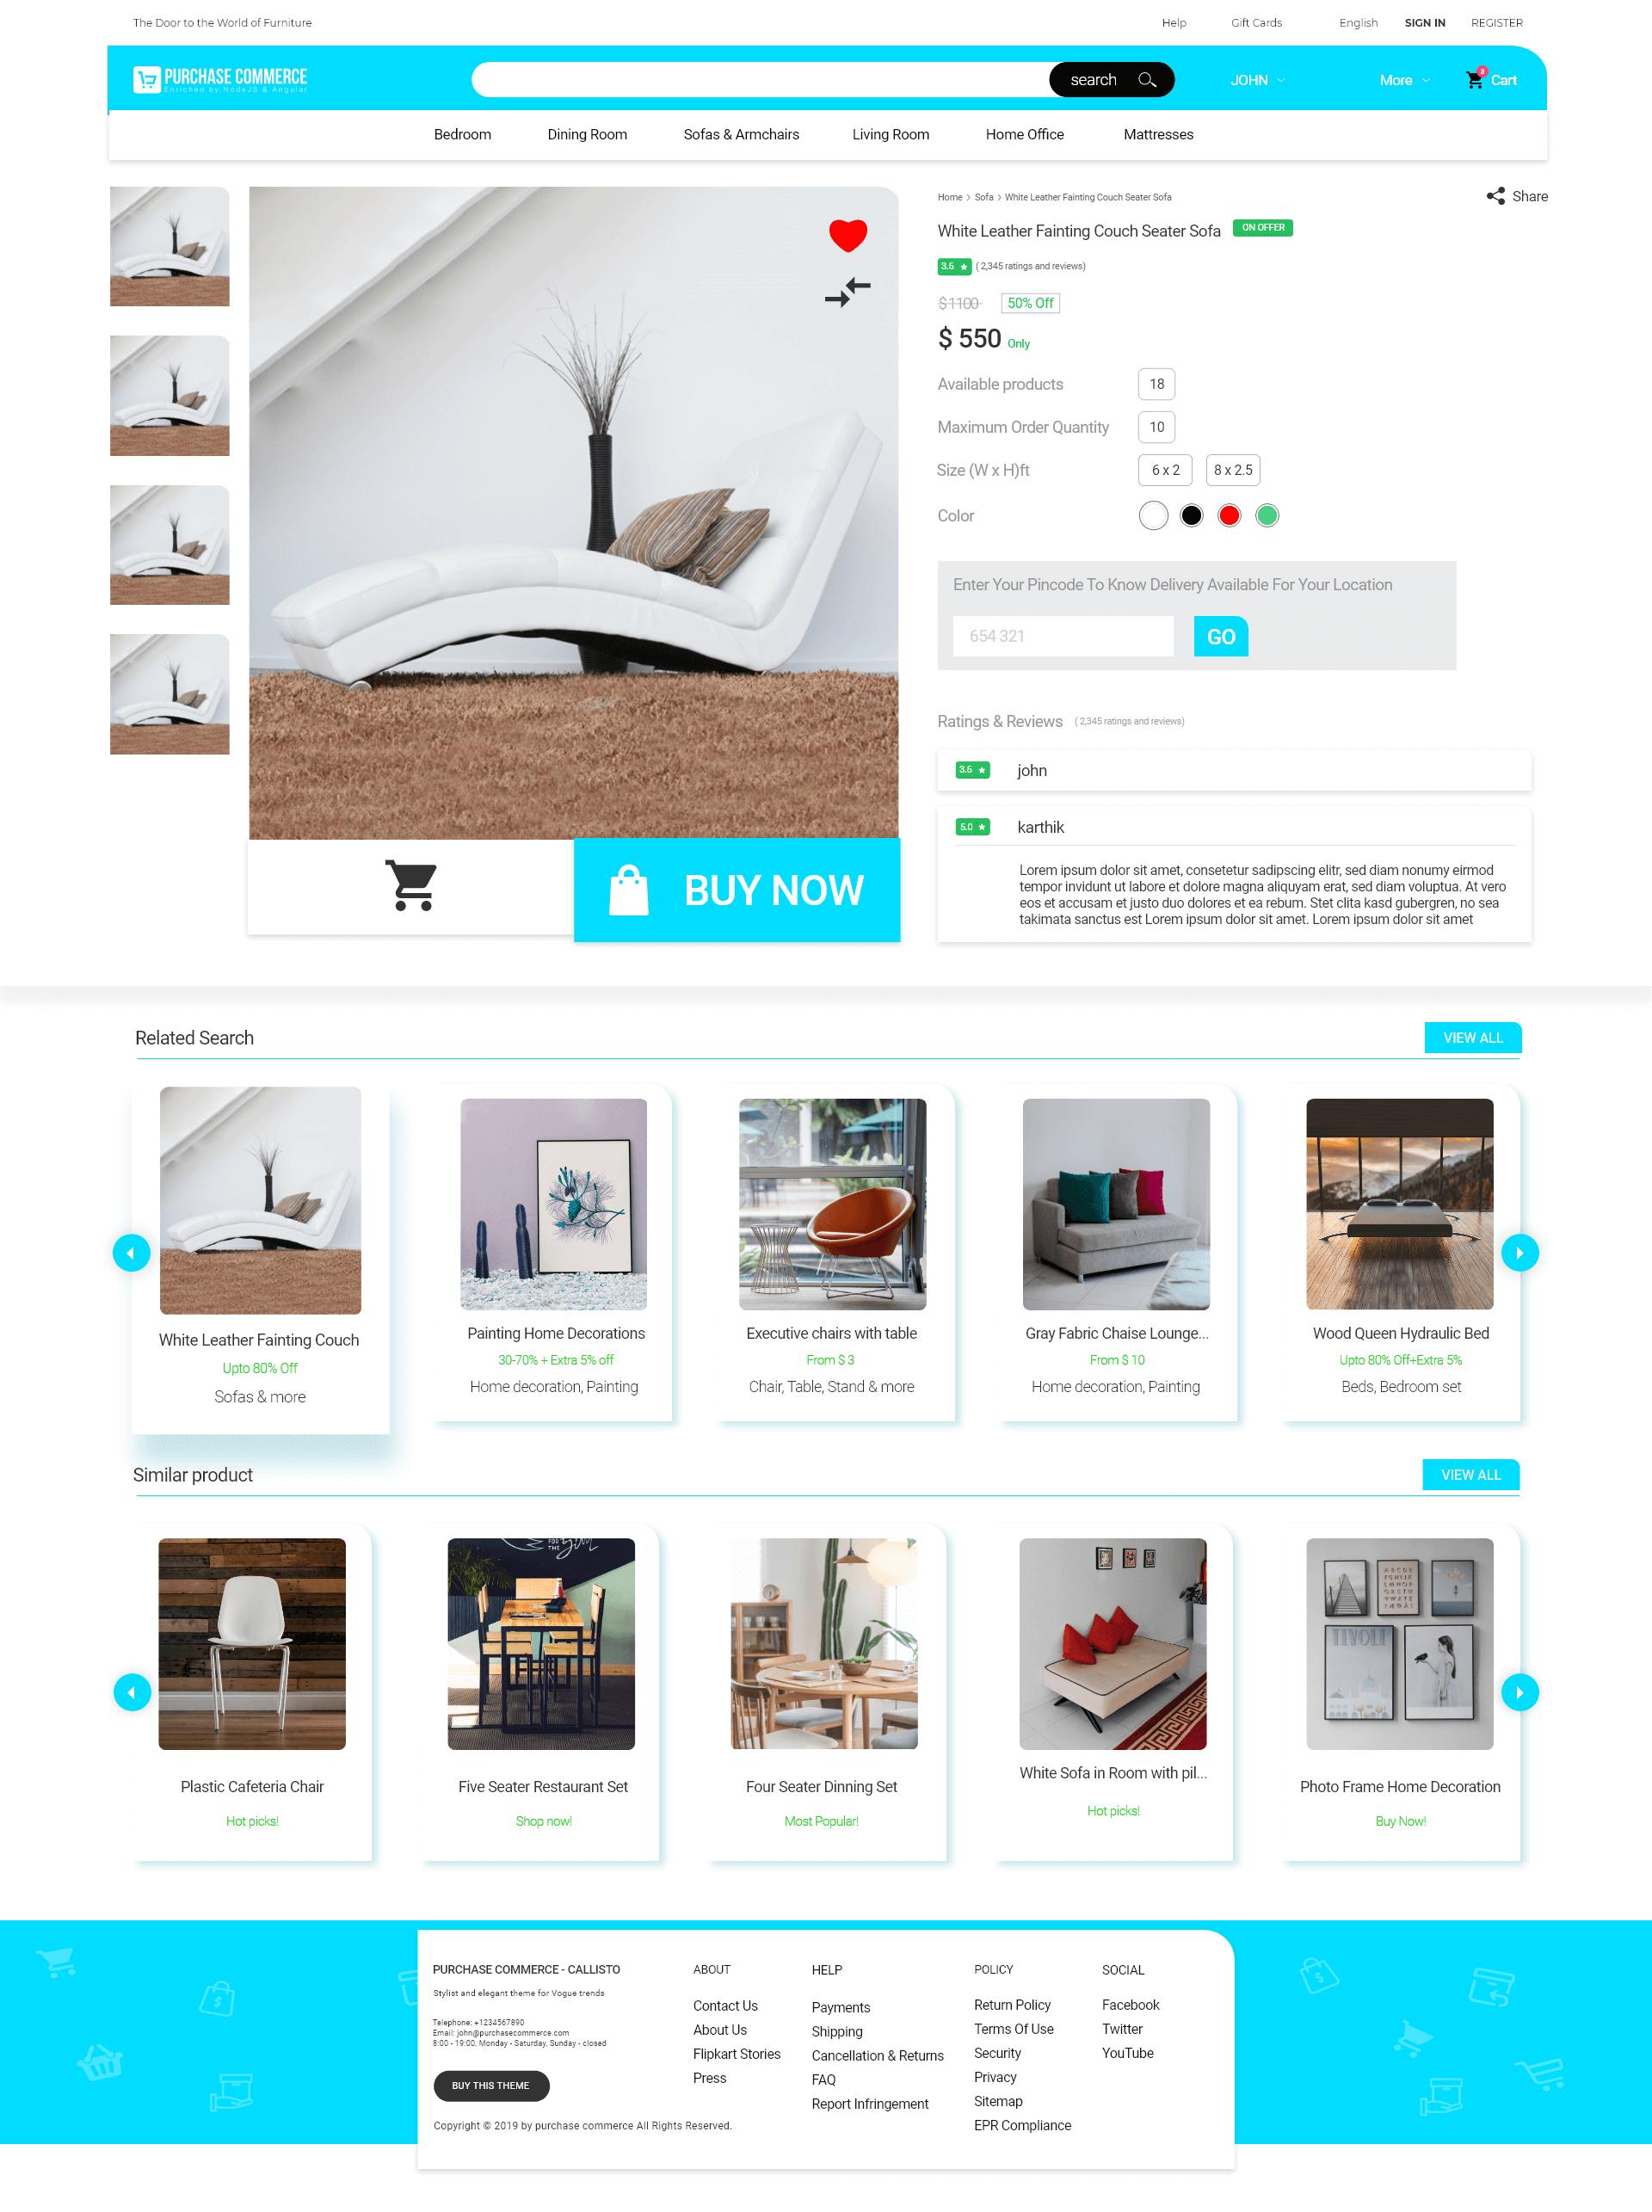 furniture-marketplace-software